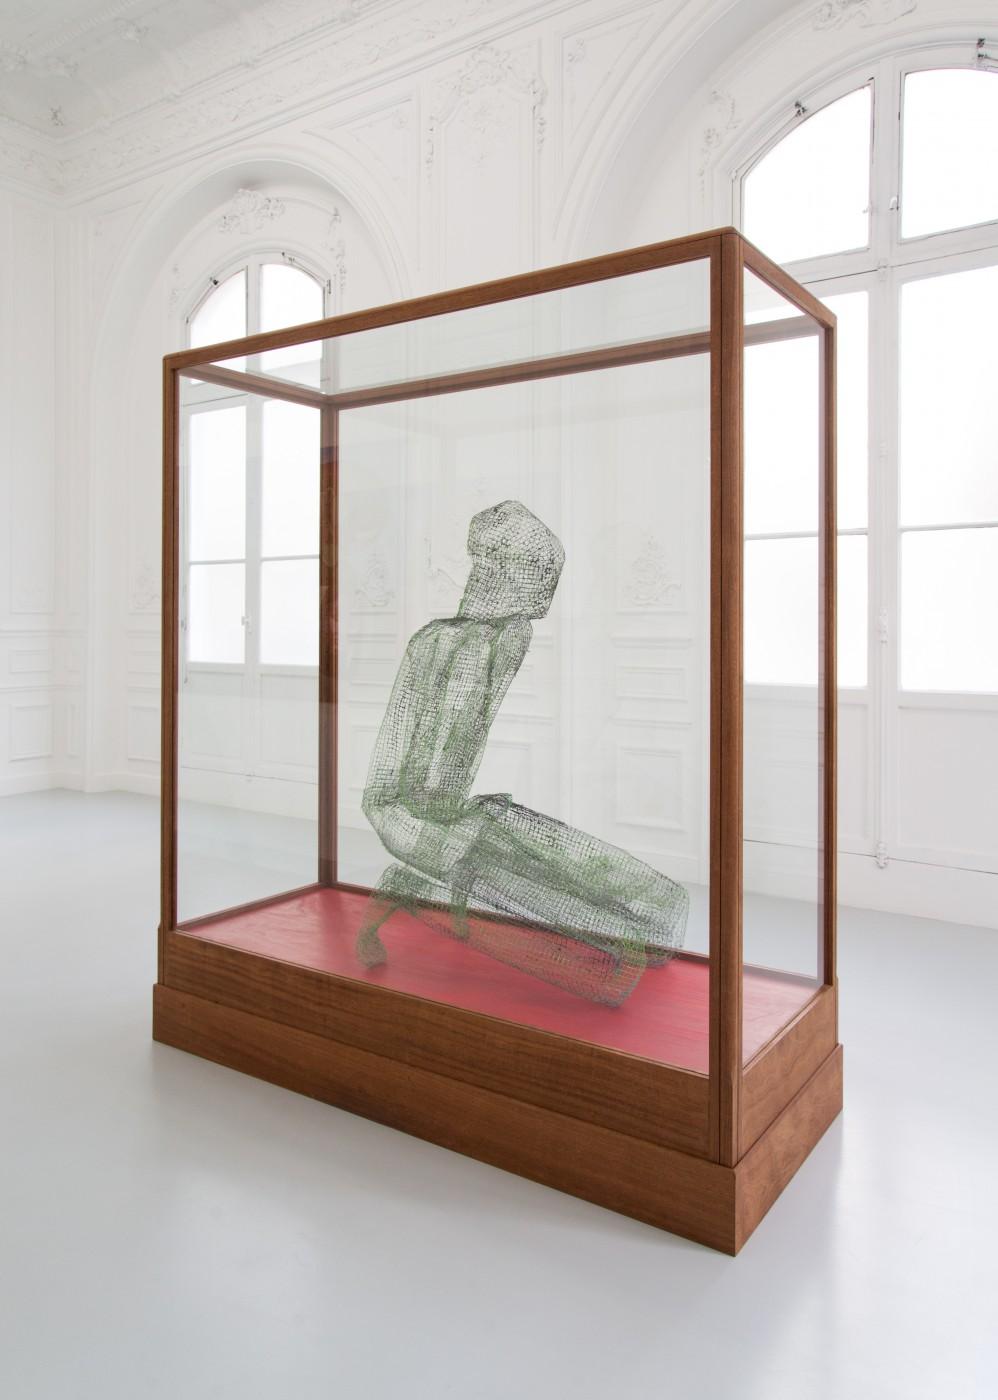 TOM HUMPHREYS  Figure Verte</I>, 2018 Metal, paint, glass, wood 201 x 179 x 73 cm / 79.1 x 70.4 x 28.7 in